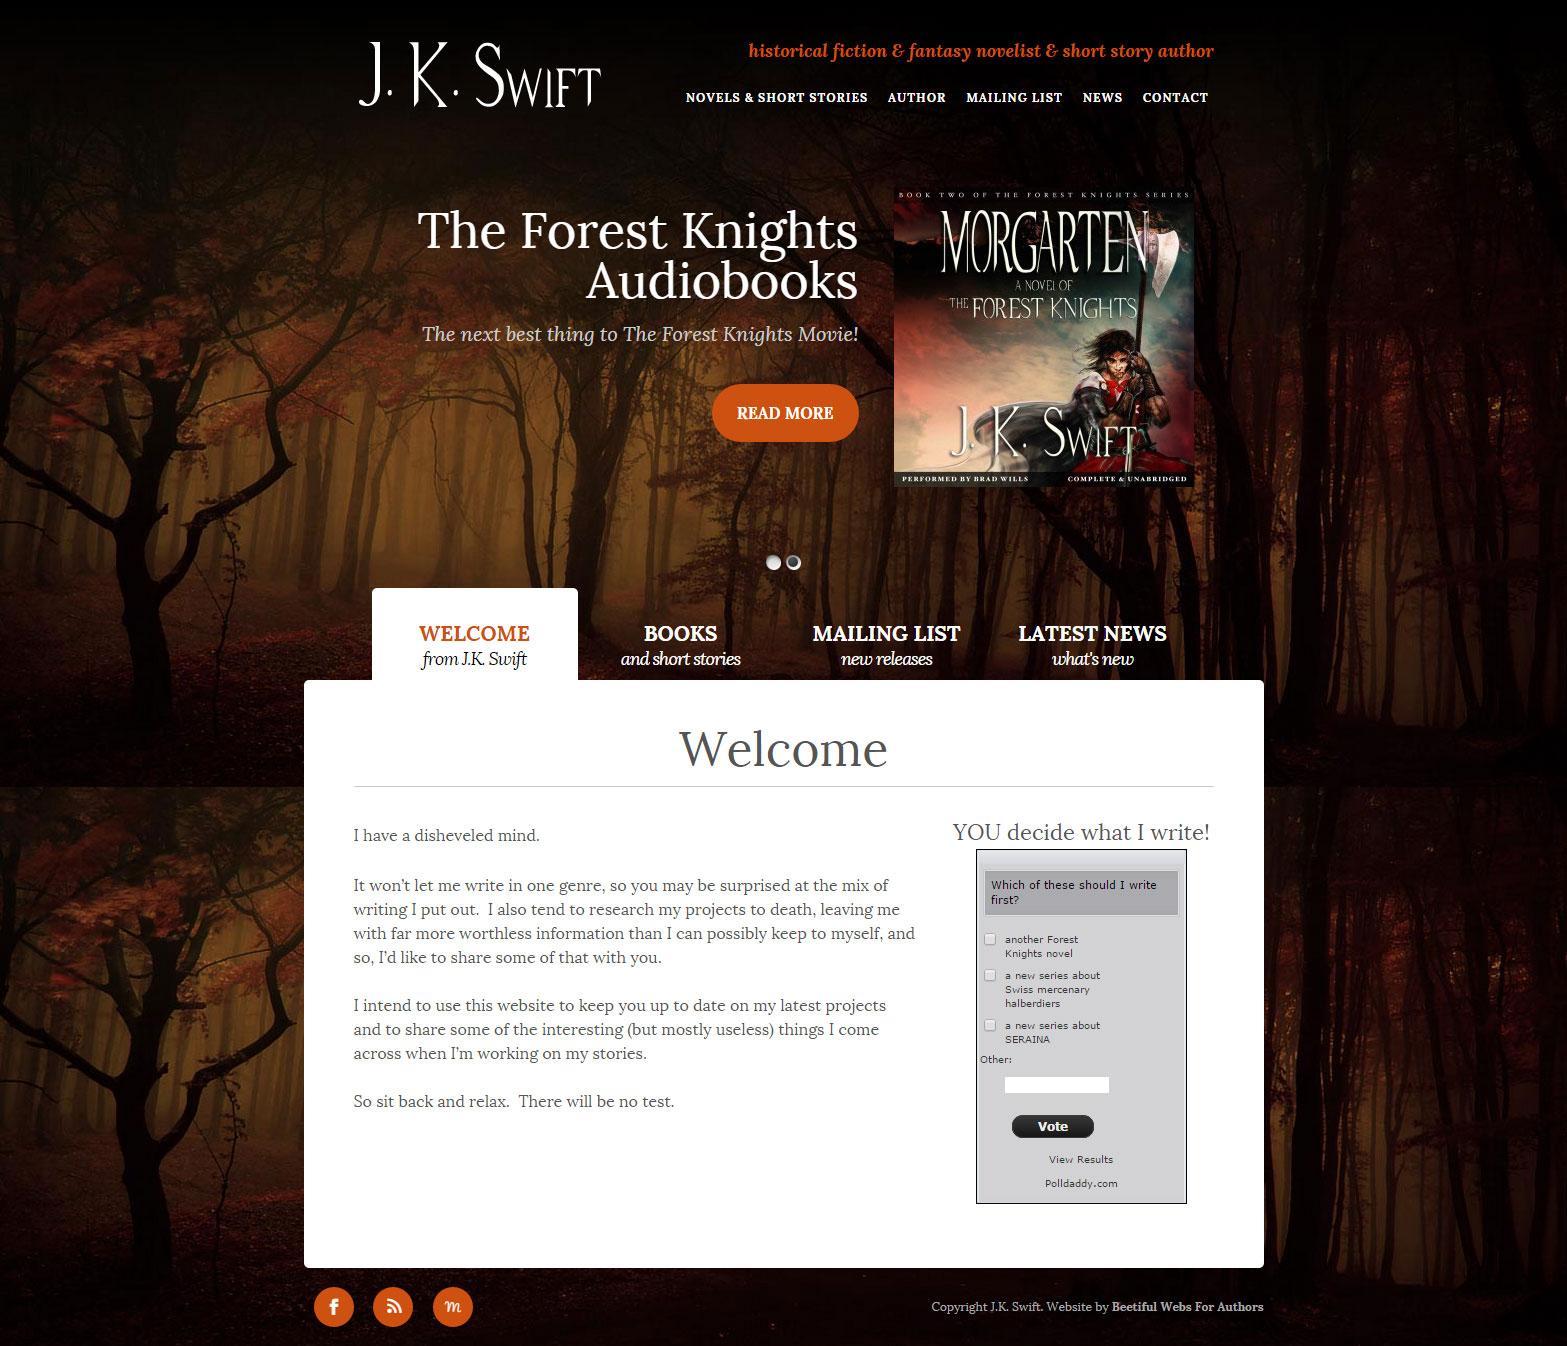 J.K. Swift website (jkswift.com)